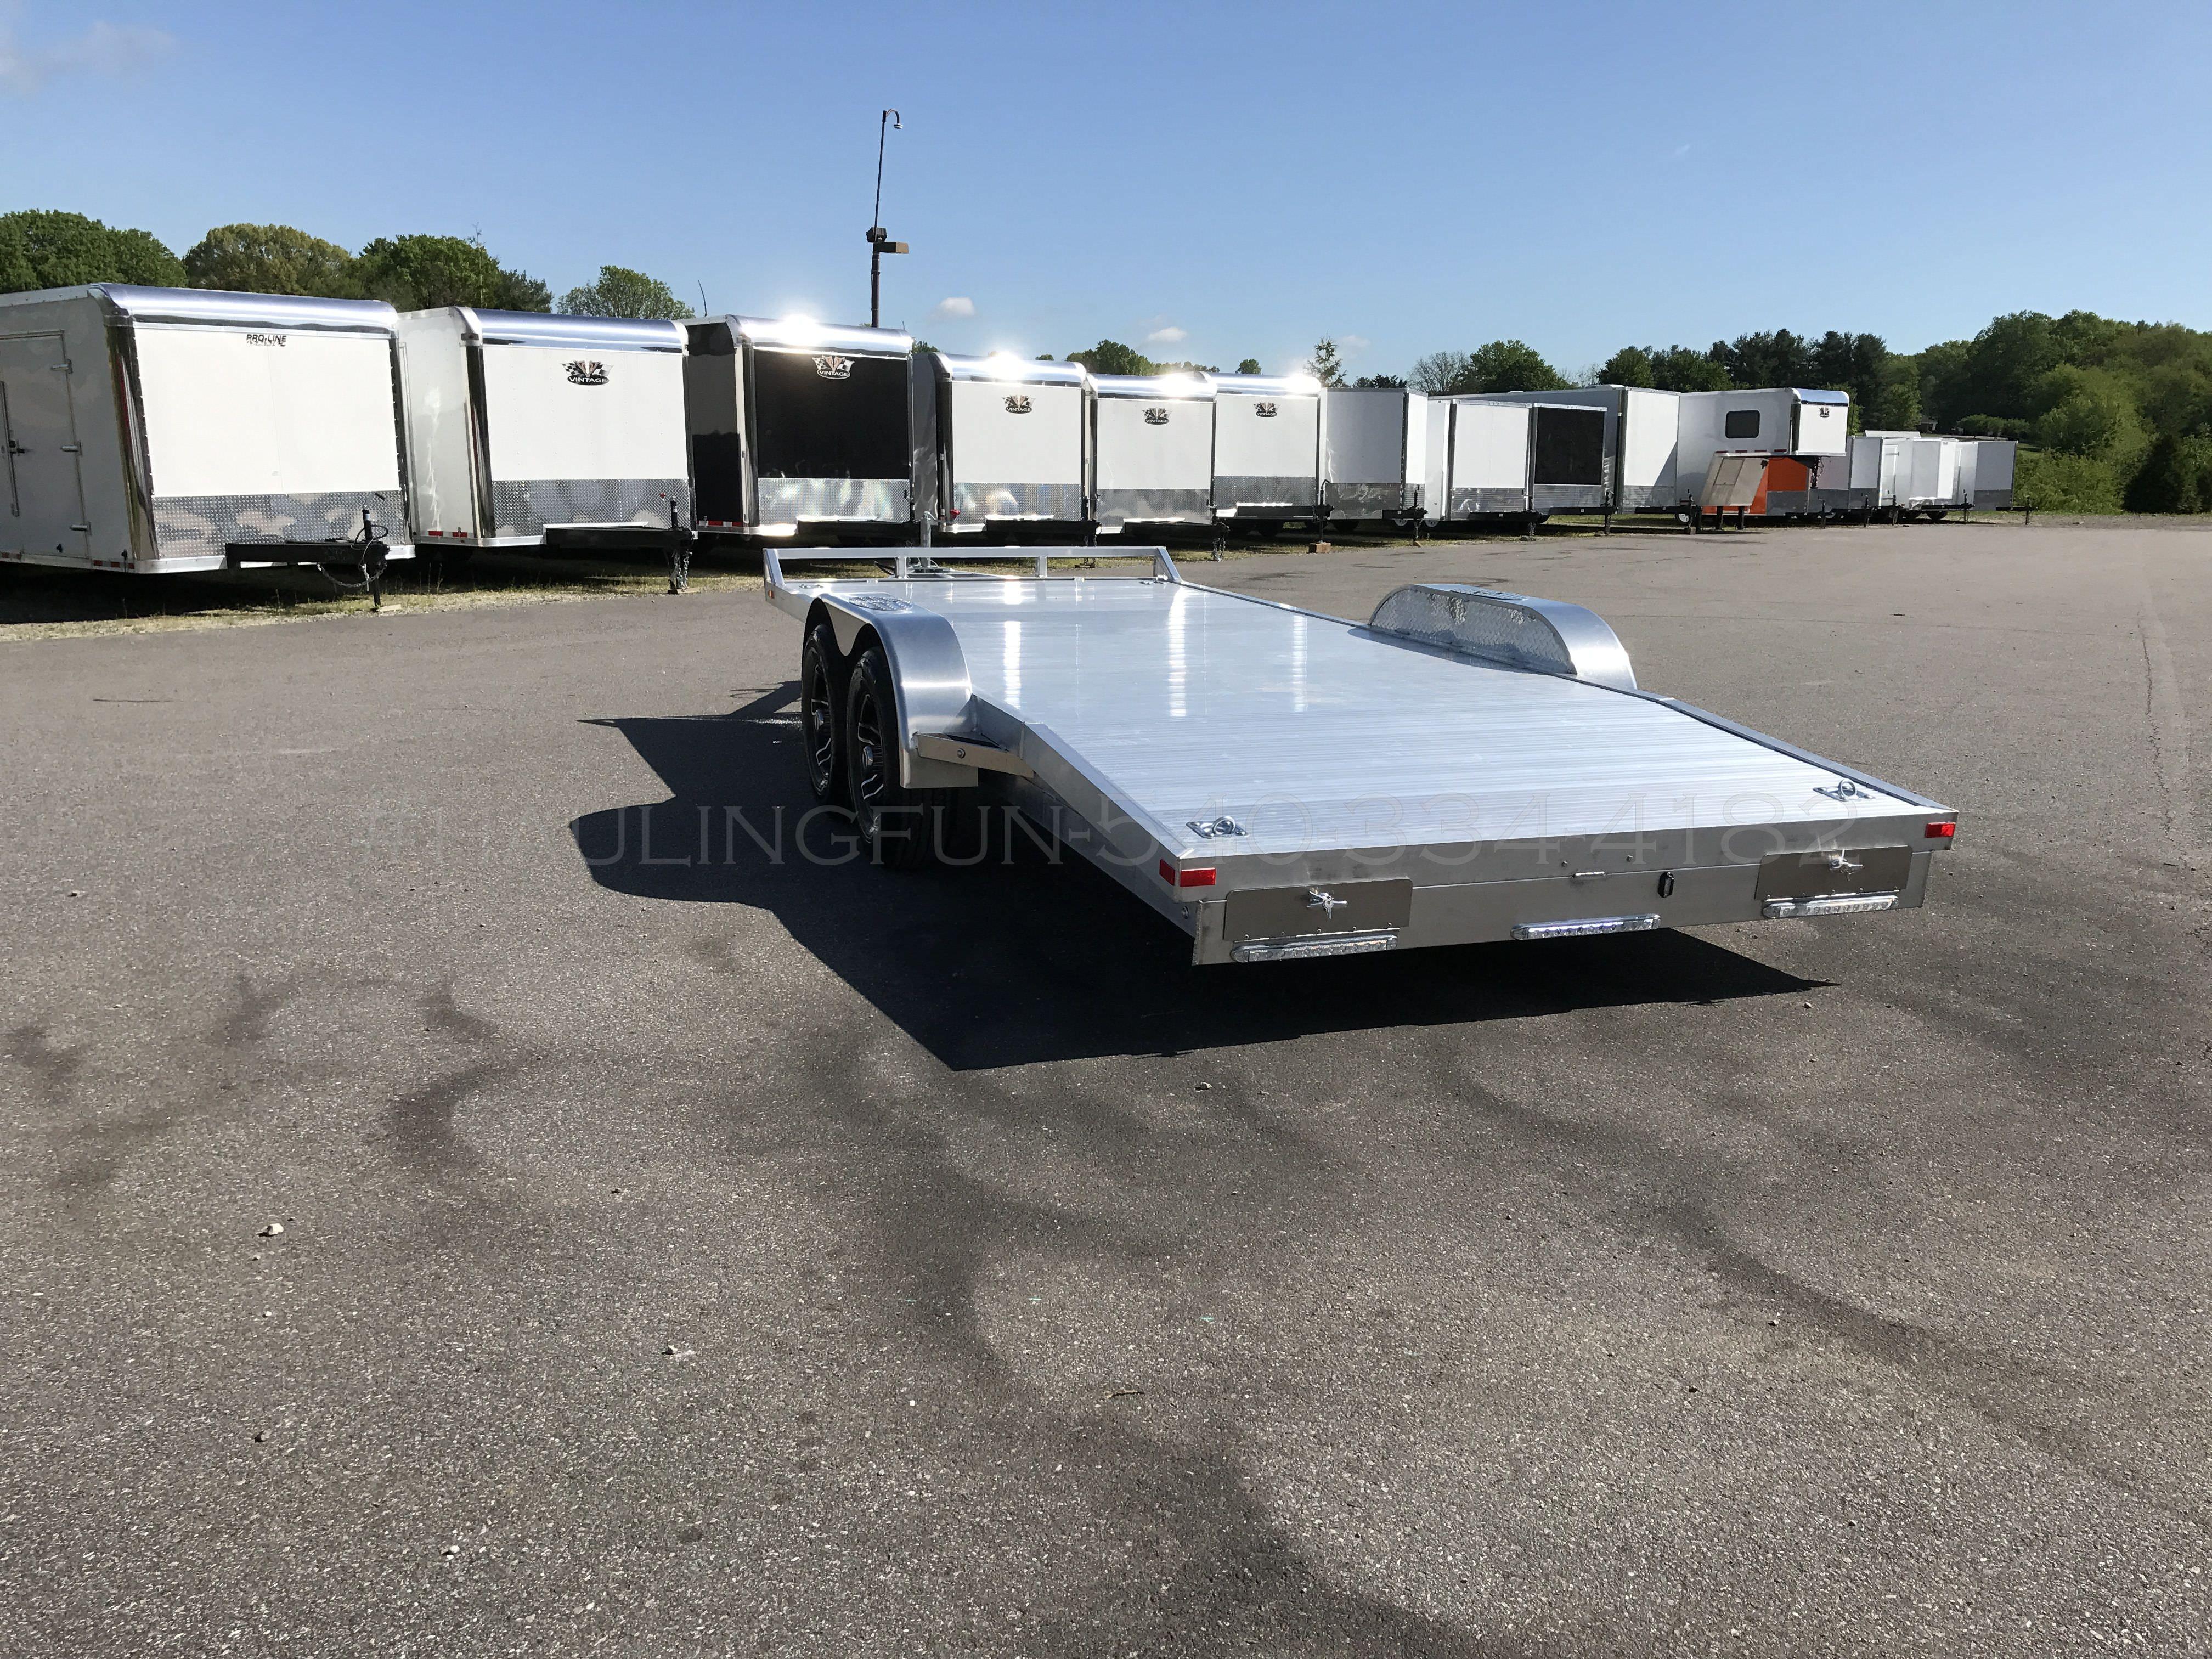 18 Aluminum Car Trailer 10 000 Gvw Pro Line Trailers